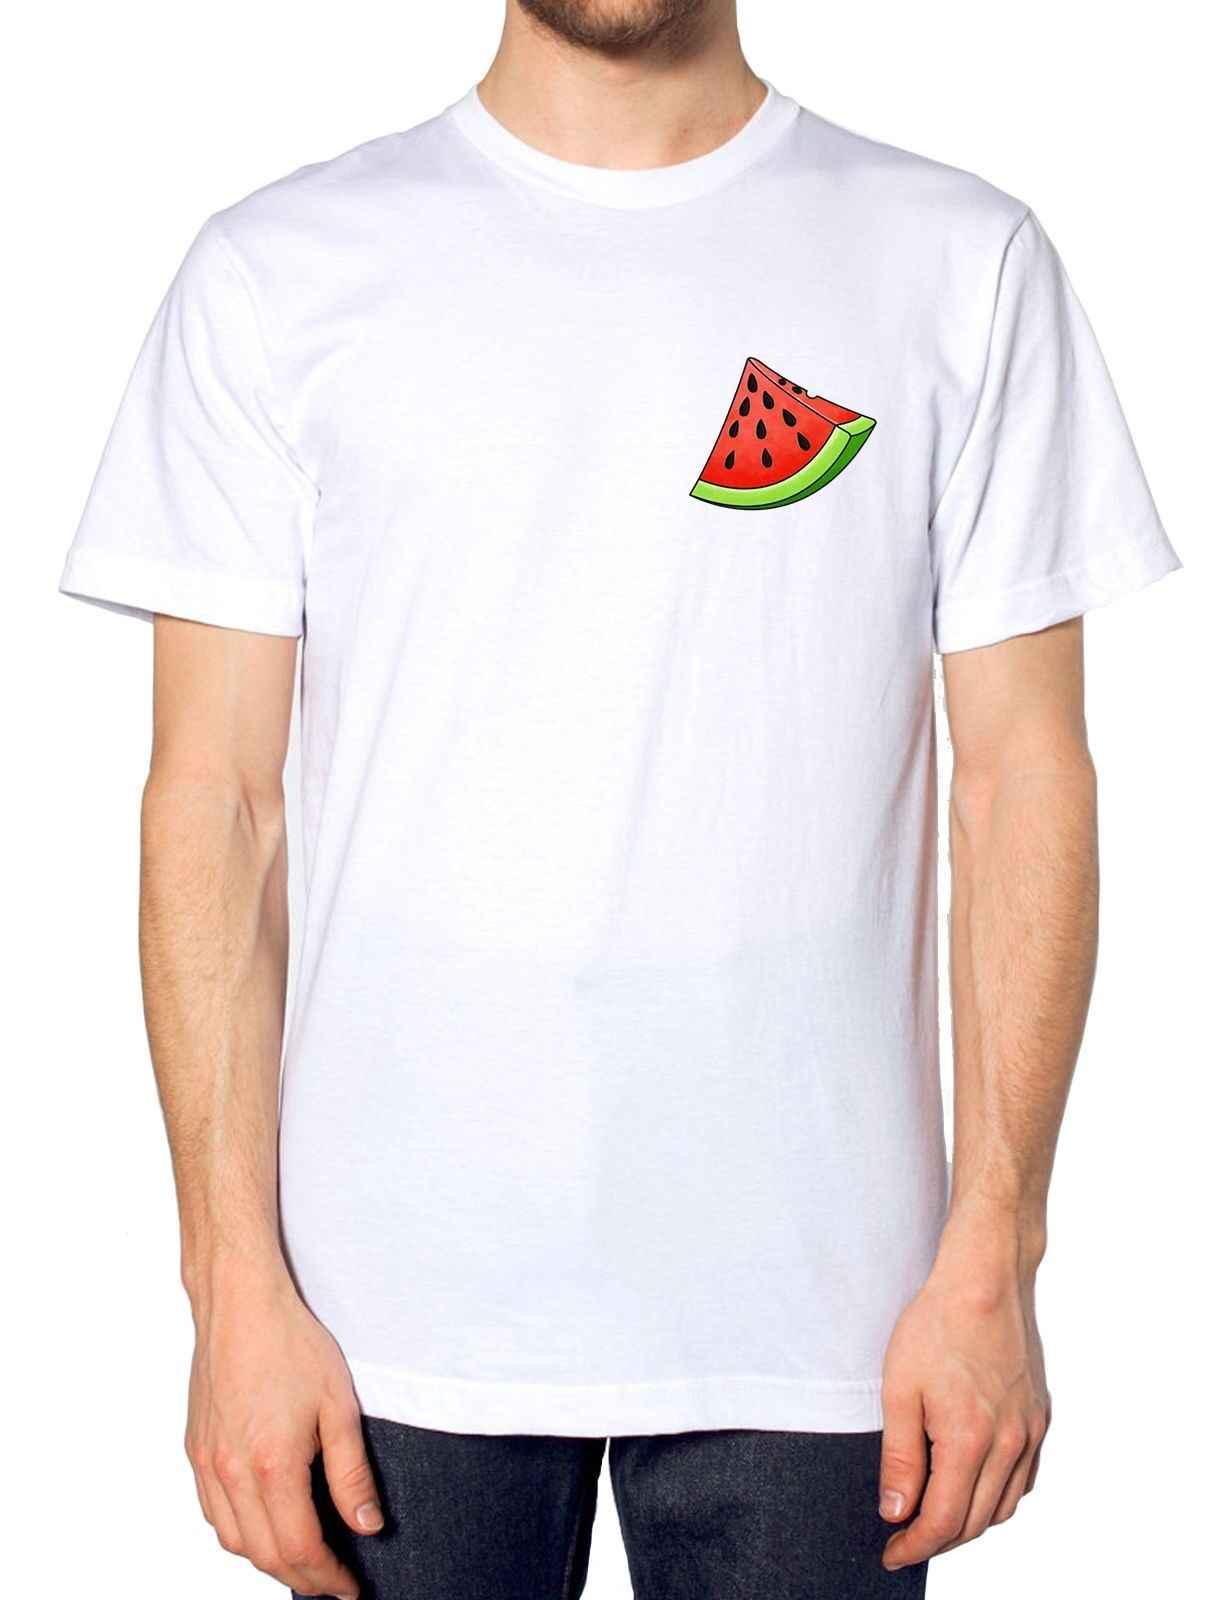 Watermeloen Logo T-shirt Zomer Mode Fruit Gezonde Tumblr Indie Stijl Mens Kidcustom gedrukte t-shirt, hip hop grappige tee